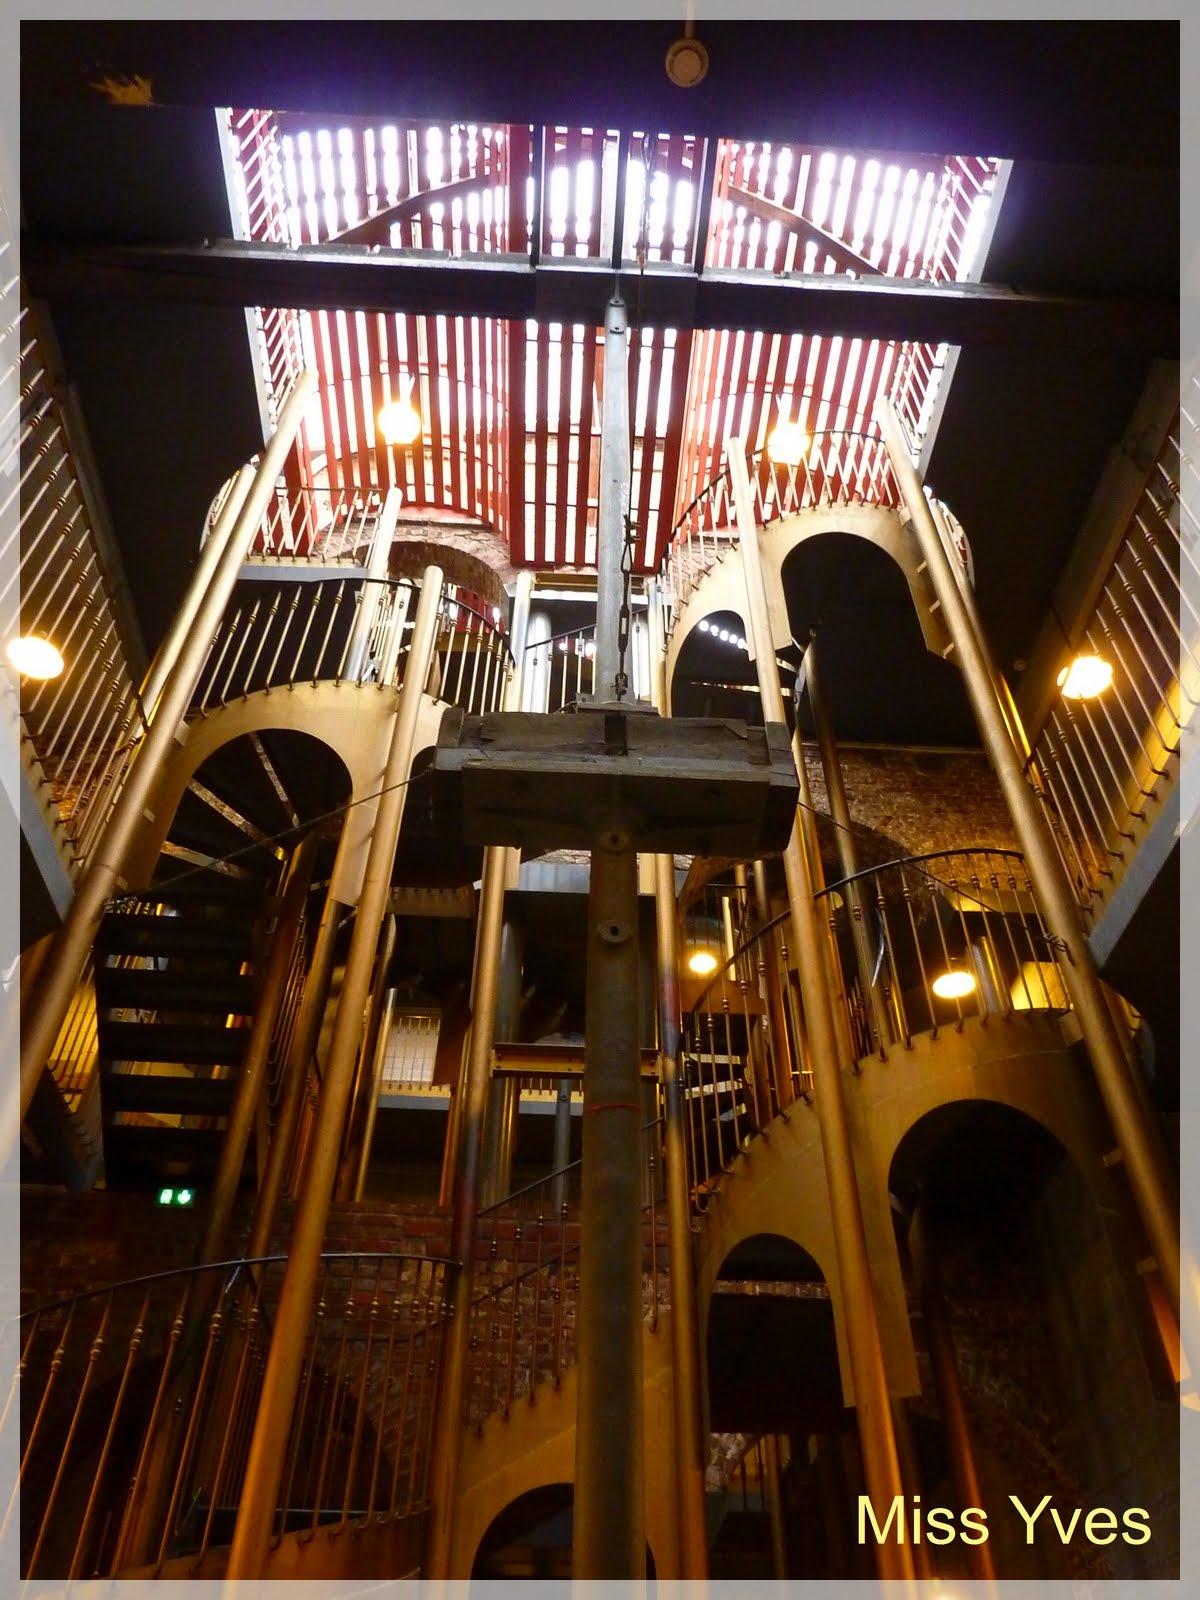 photograff l 39 esprit d 39 escalier. Black Bedroom Furniture Sets. Home Design Ideas